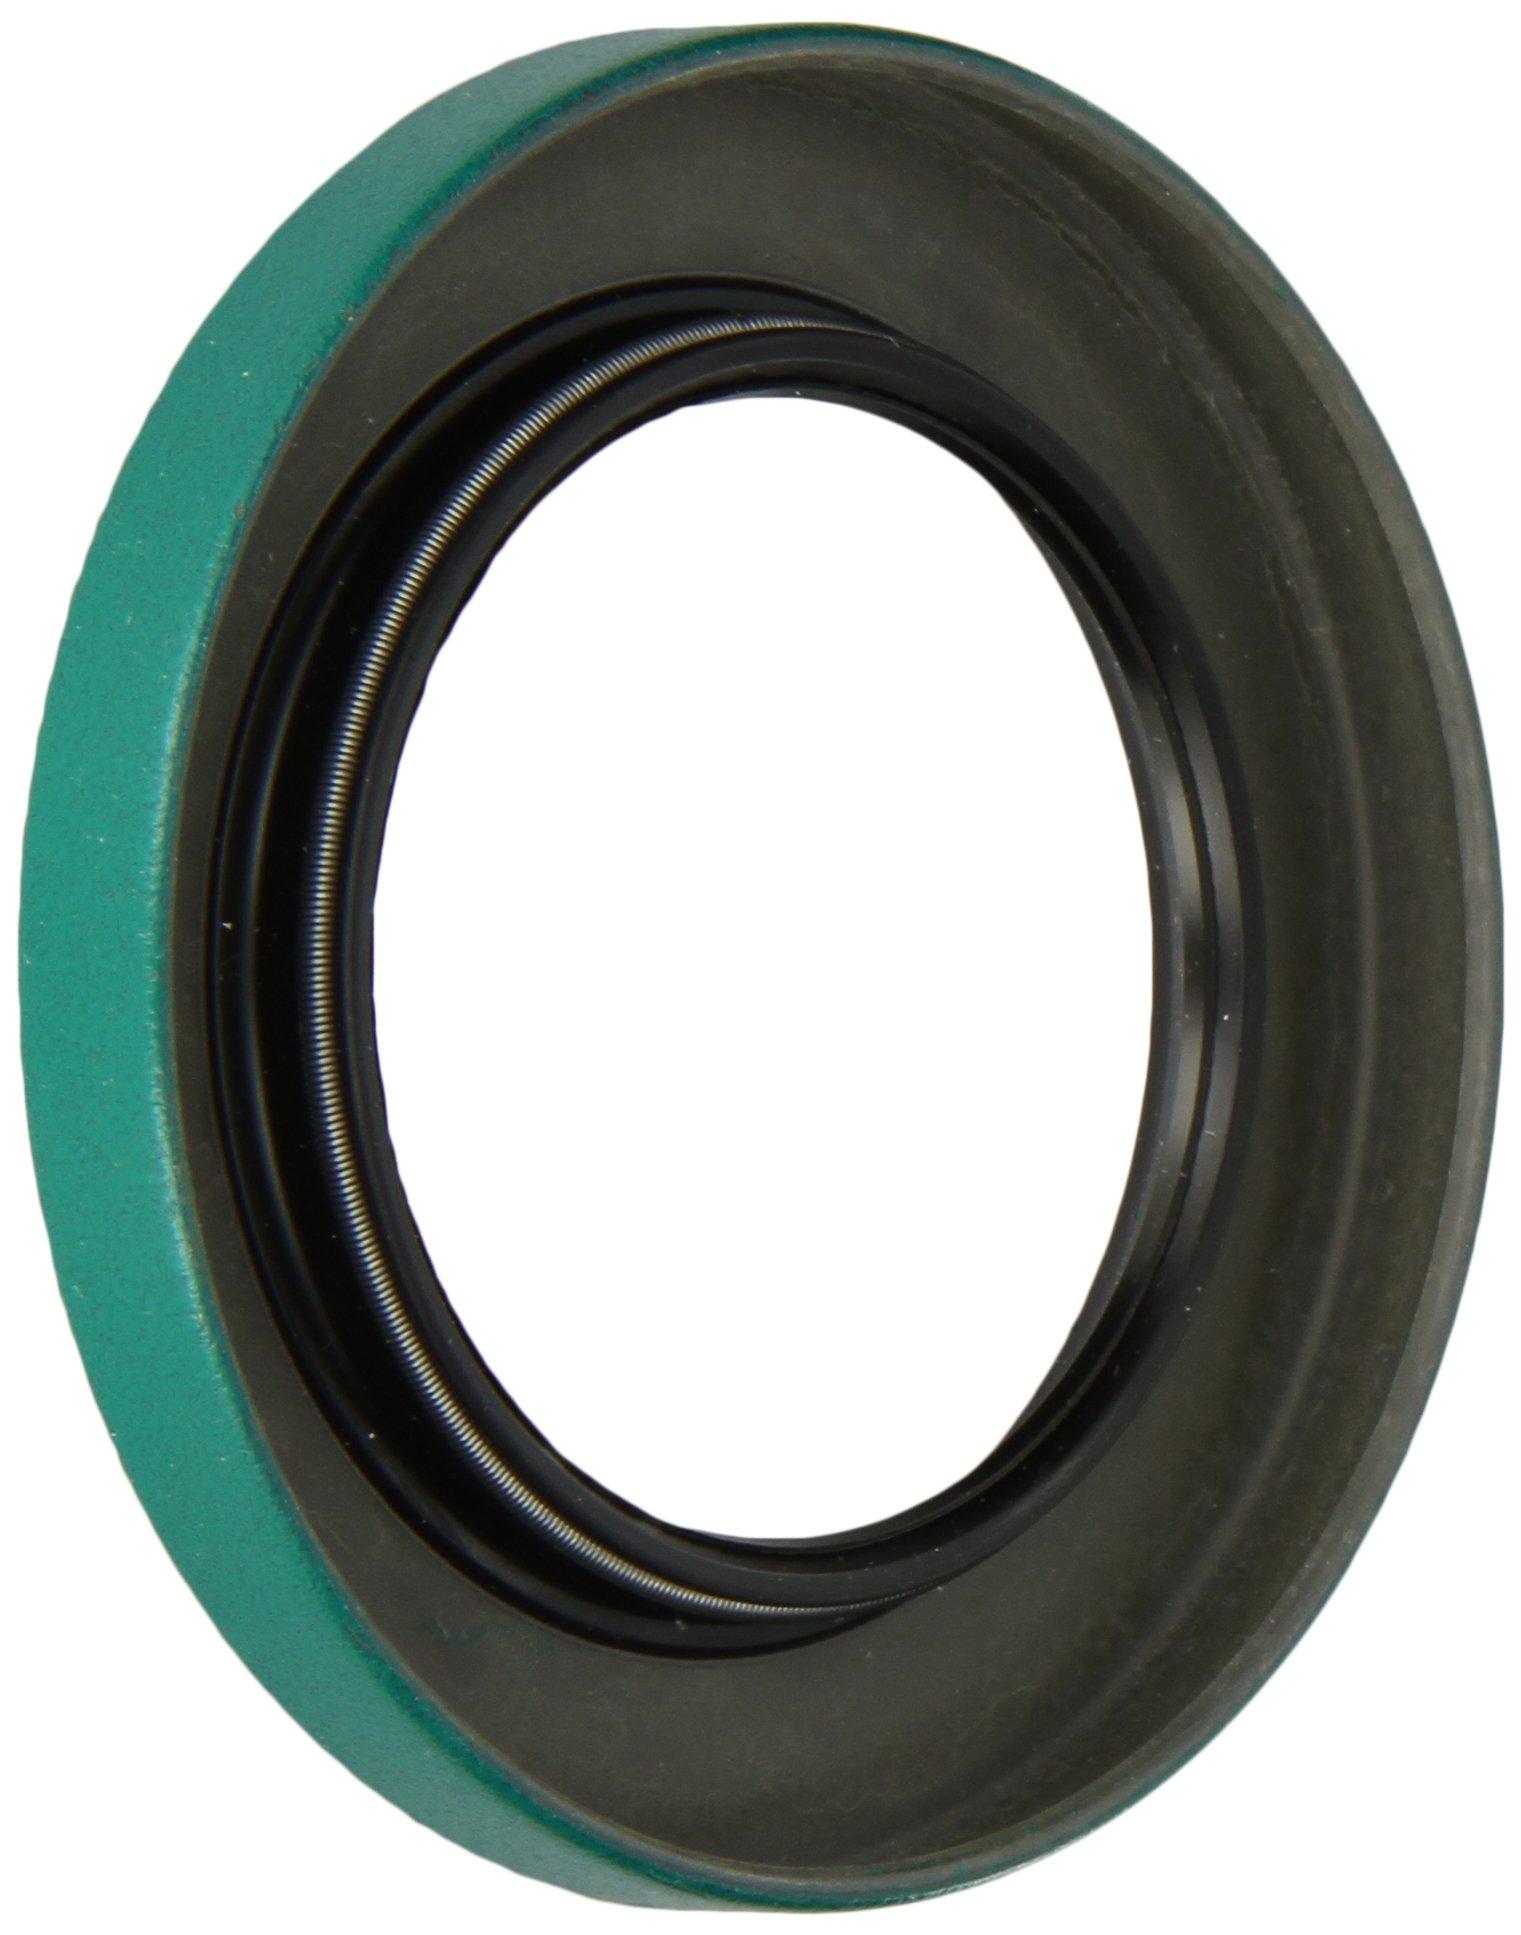 SKF 17557 LDS & Small Bore Seal, R Lip Code, CRW1 Style, Inch, 1.75'' Shaft Diameter, 2.75'' Bore Diameter, 0.313'' Width